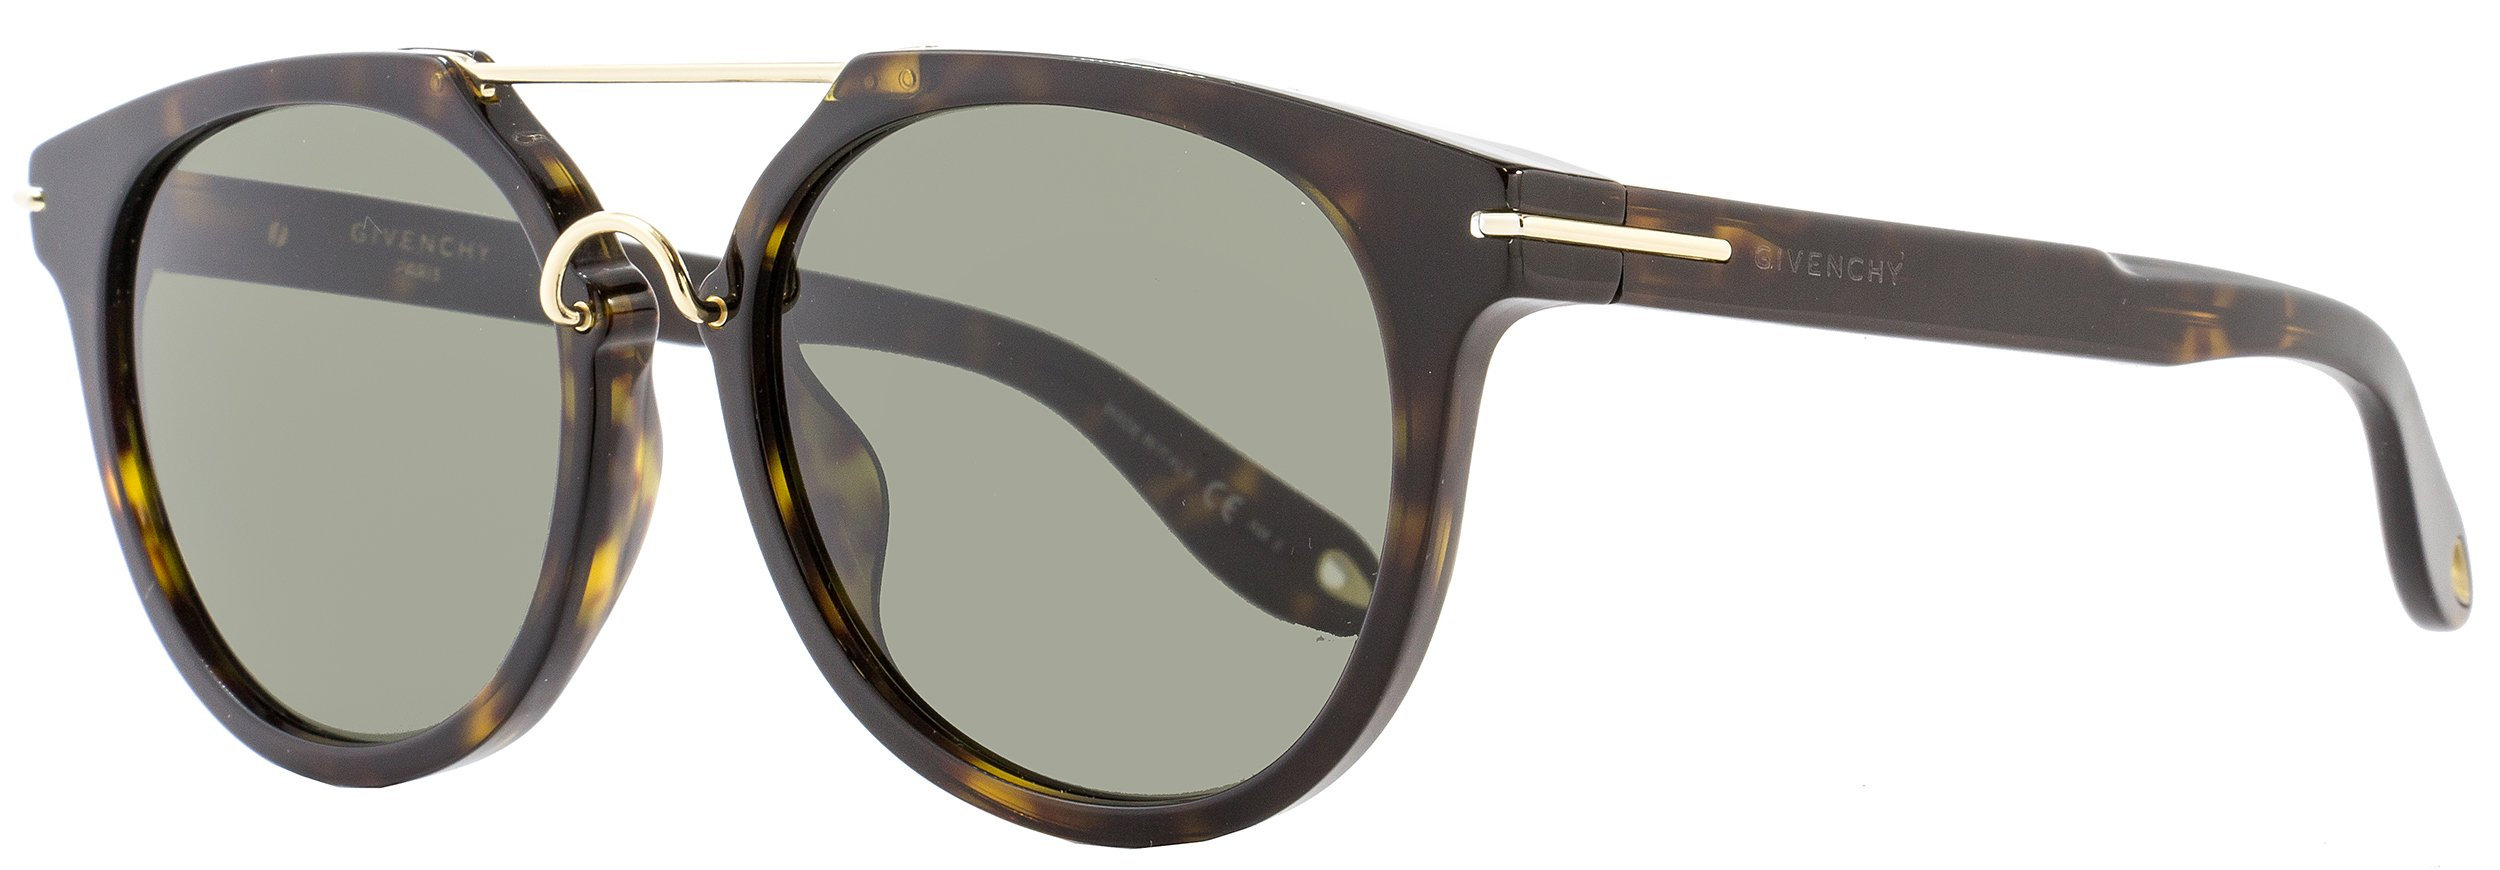 Givenchy Women's Round Aviator Sunglasses, Dark Havana/Brown, One Size